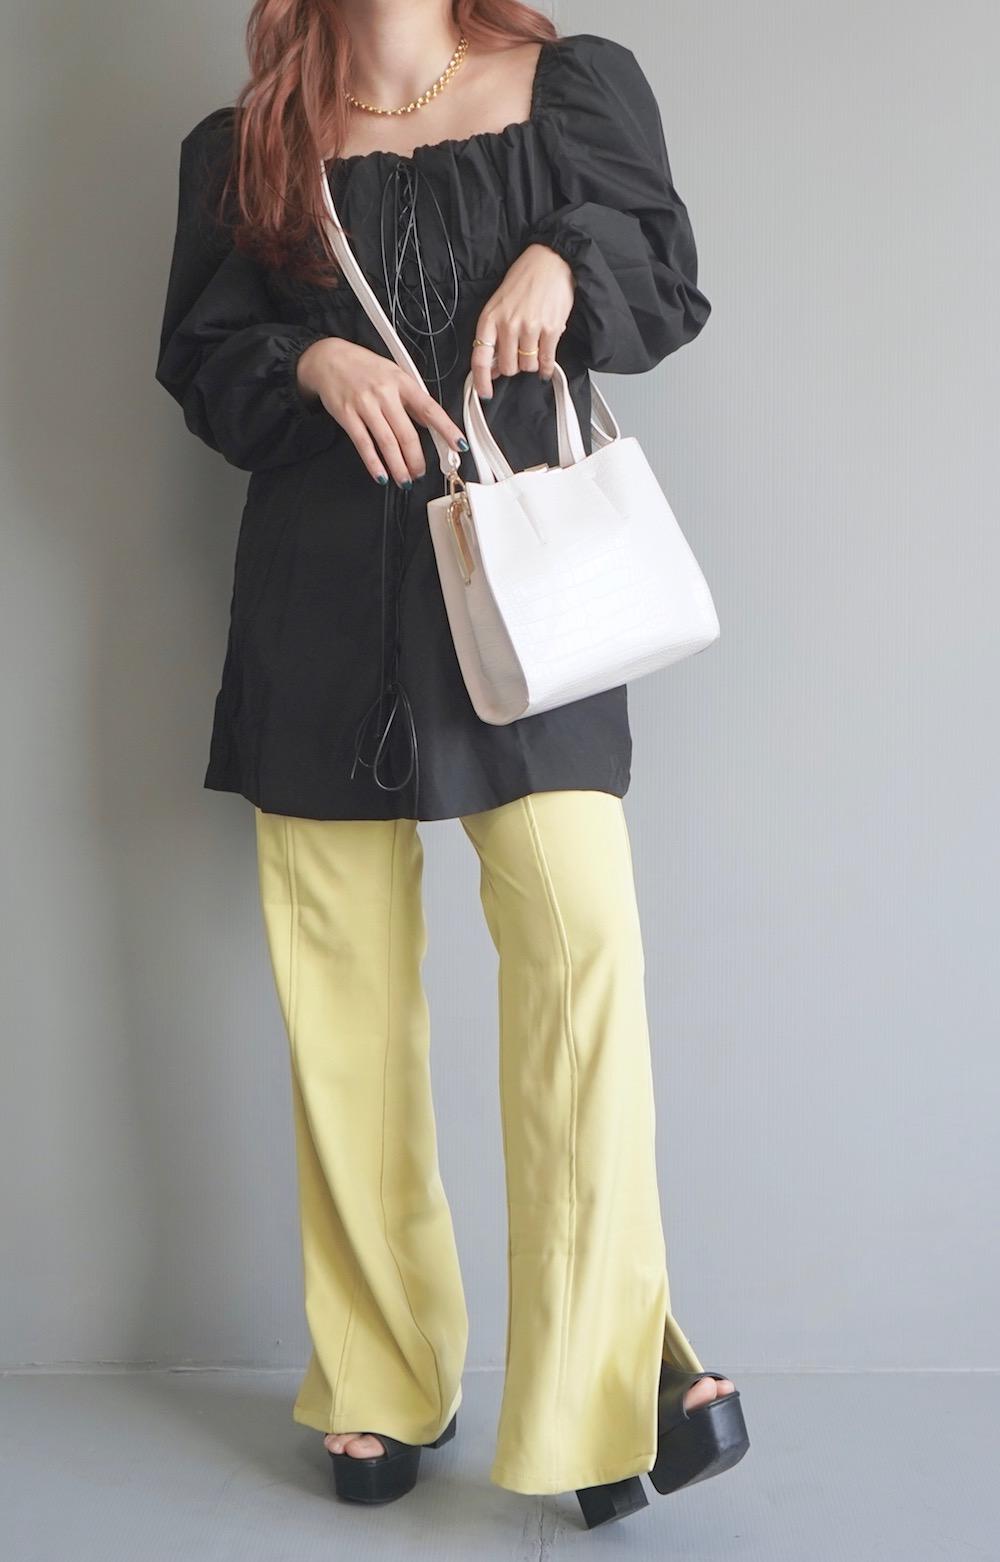 Center Seam Slit Flare Pants (Lemon yellow)